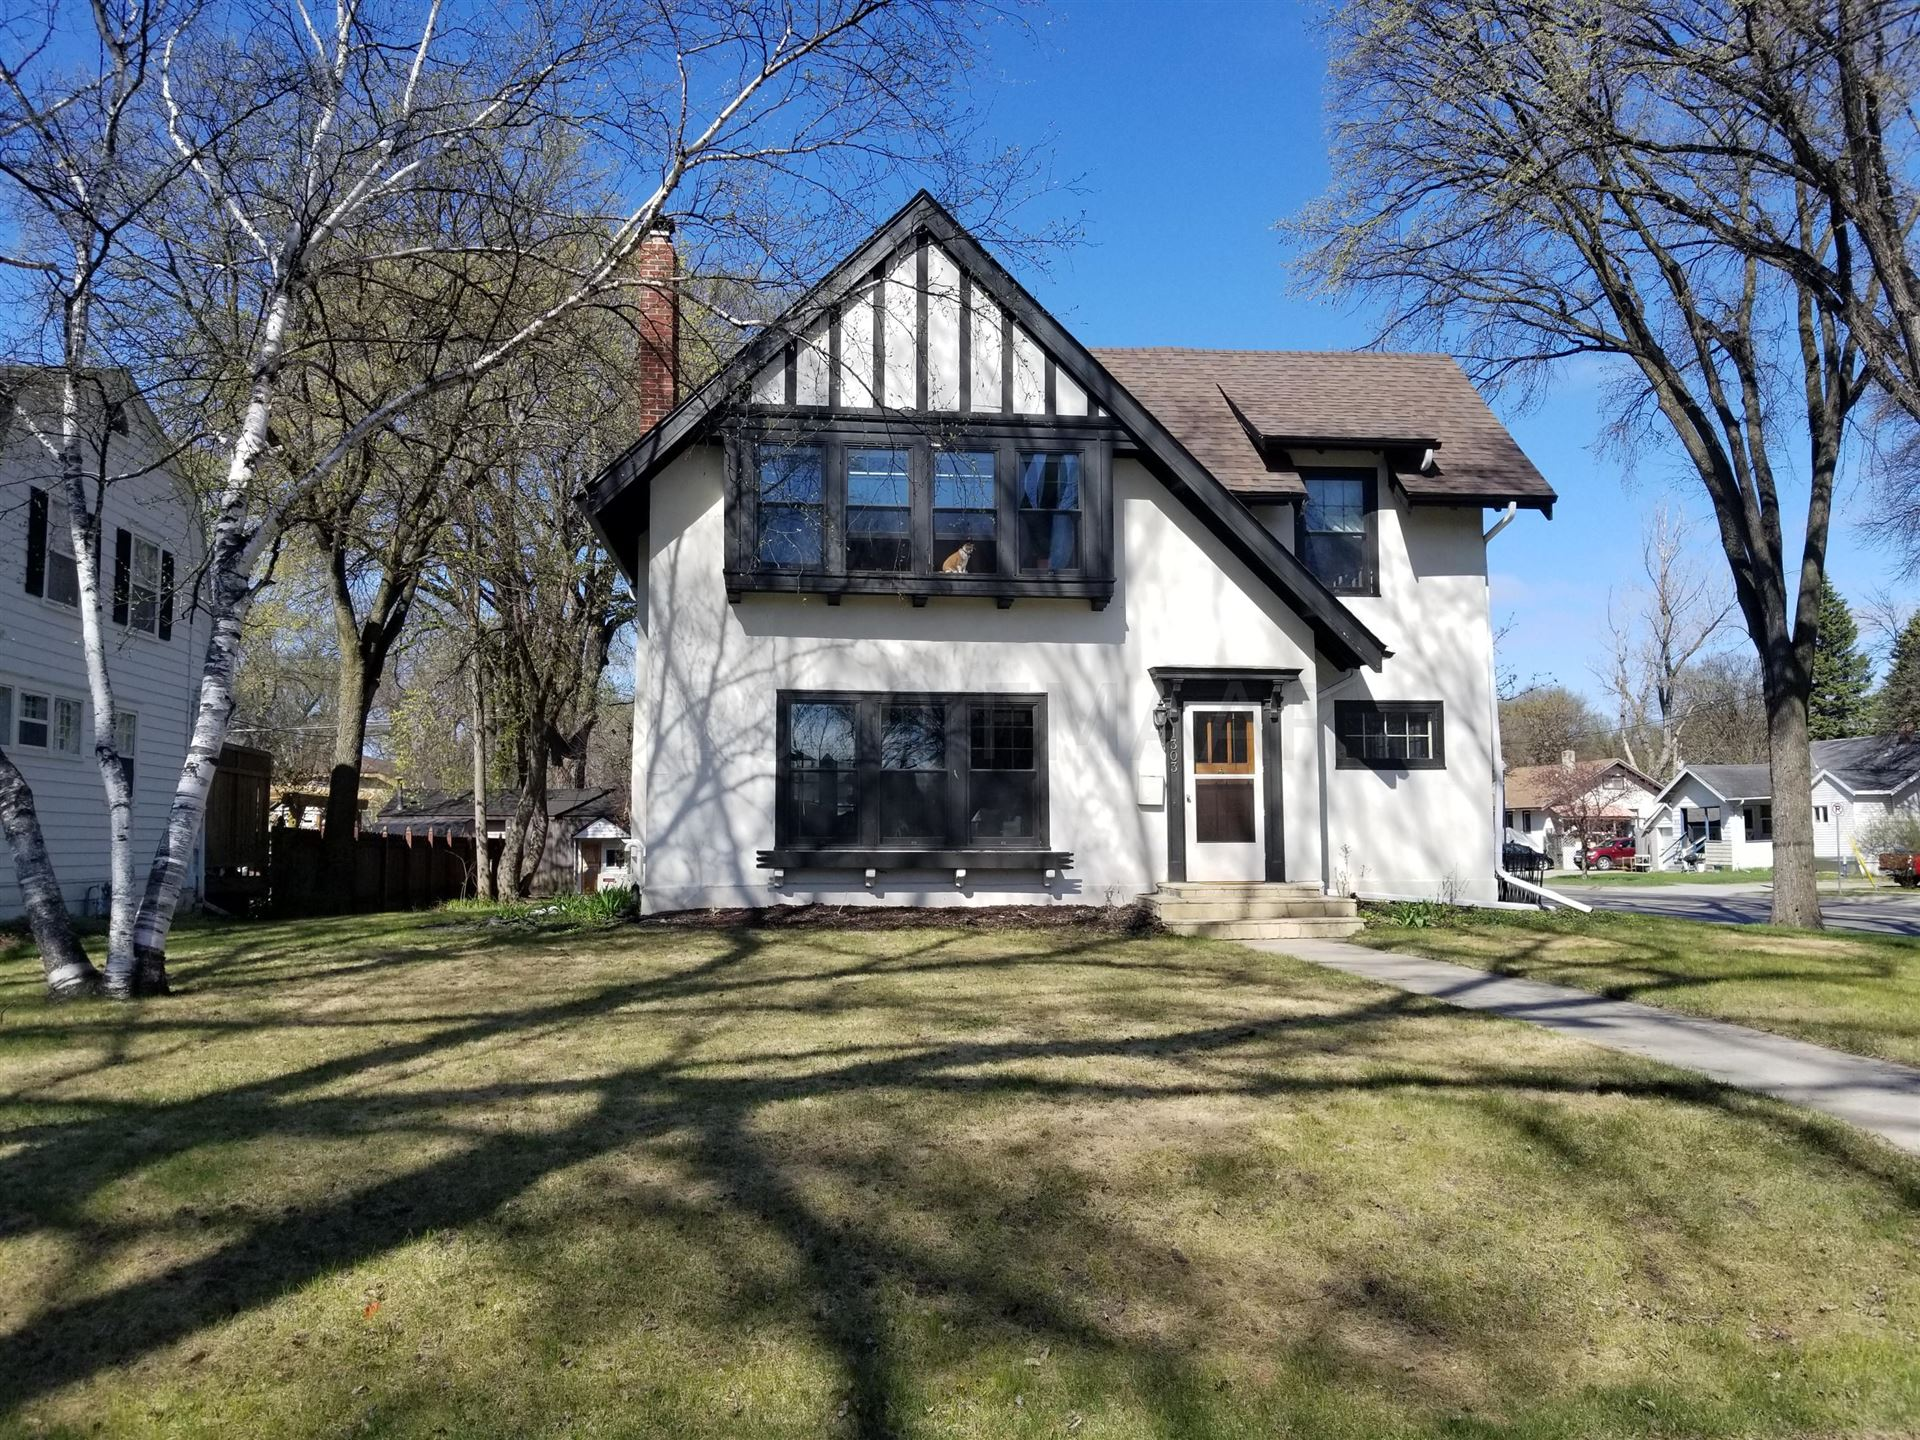 1303 9 S Street, Fargo, ND 58103 - #: 20-2247